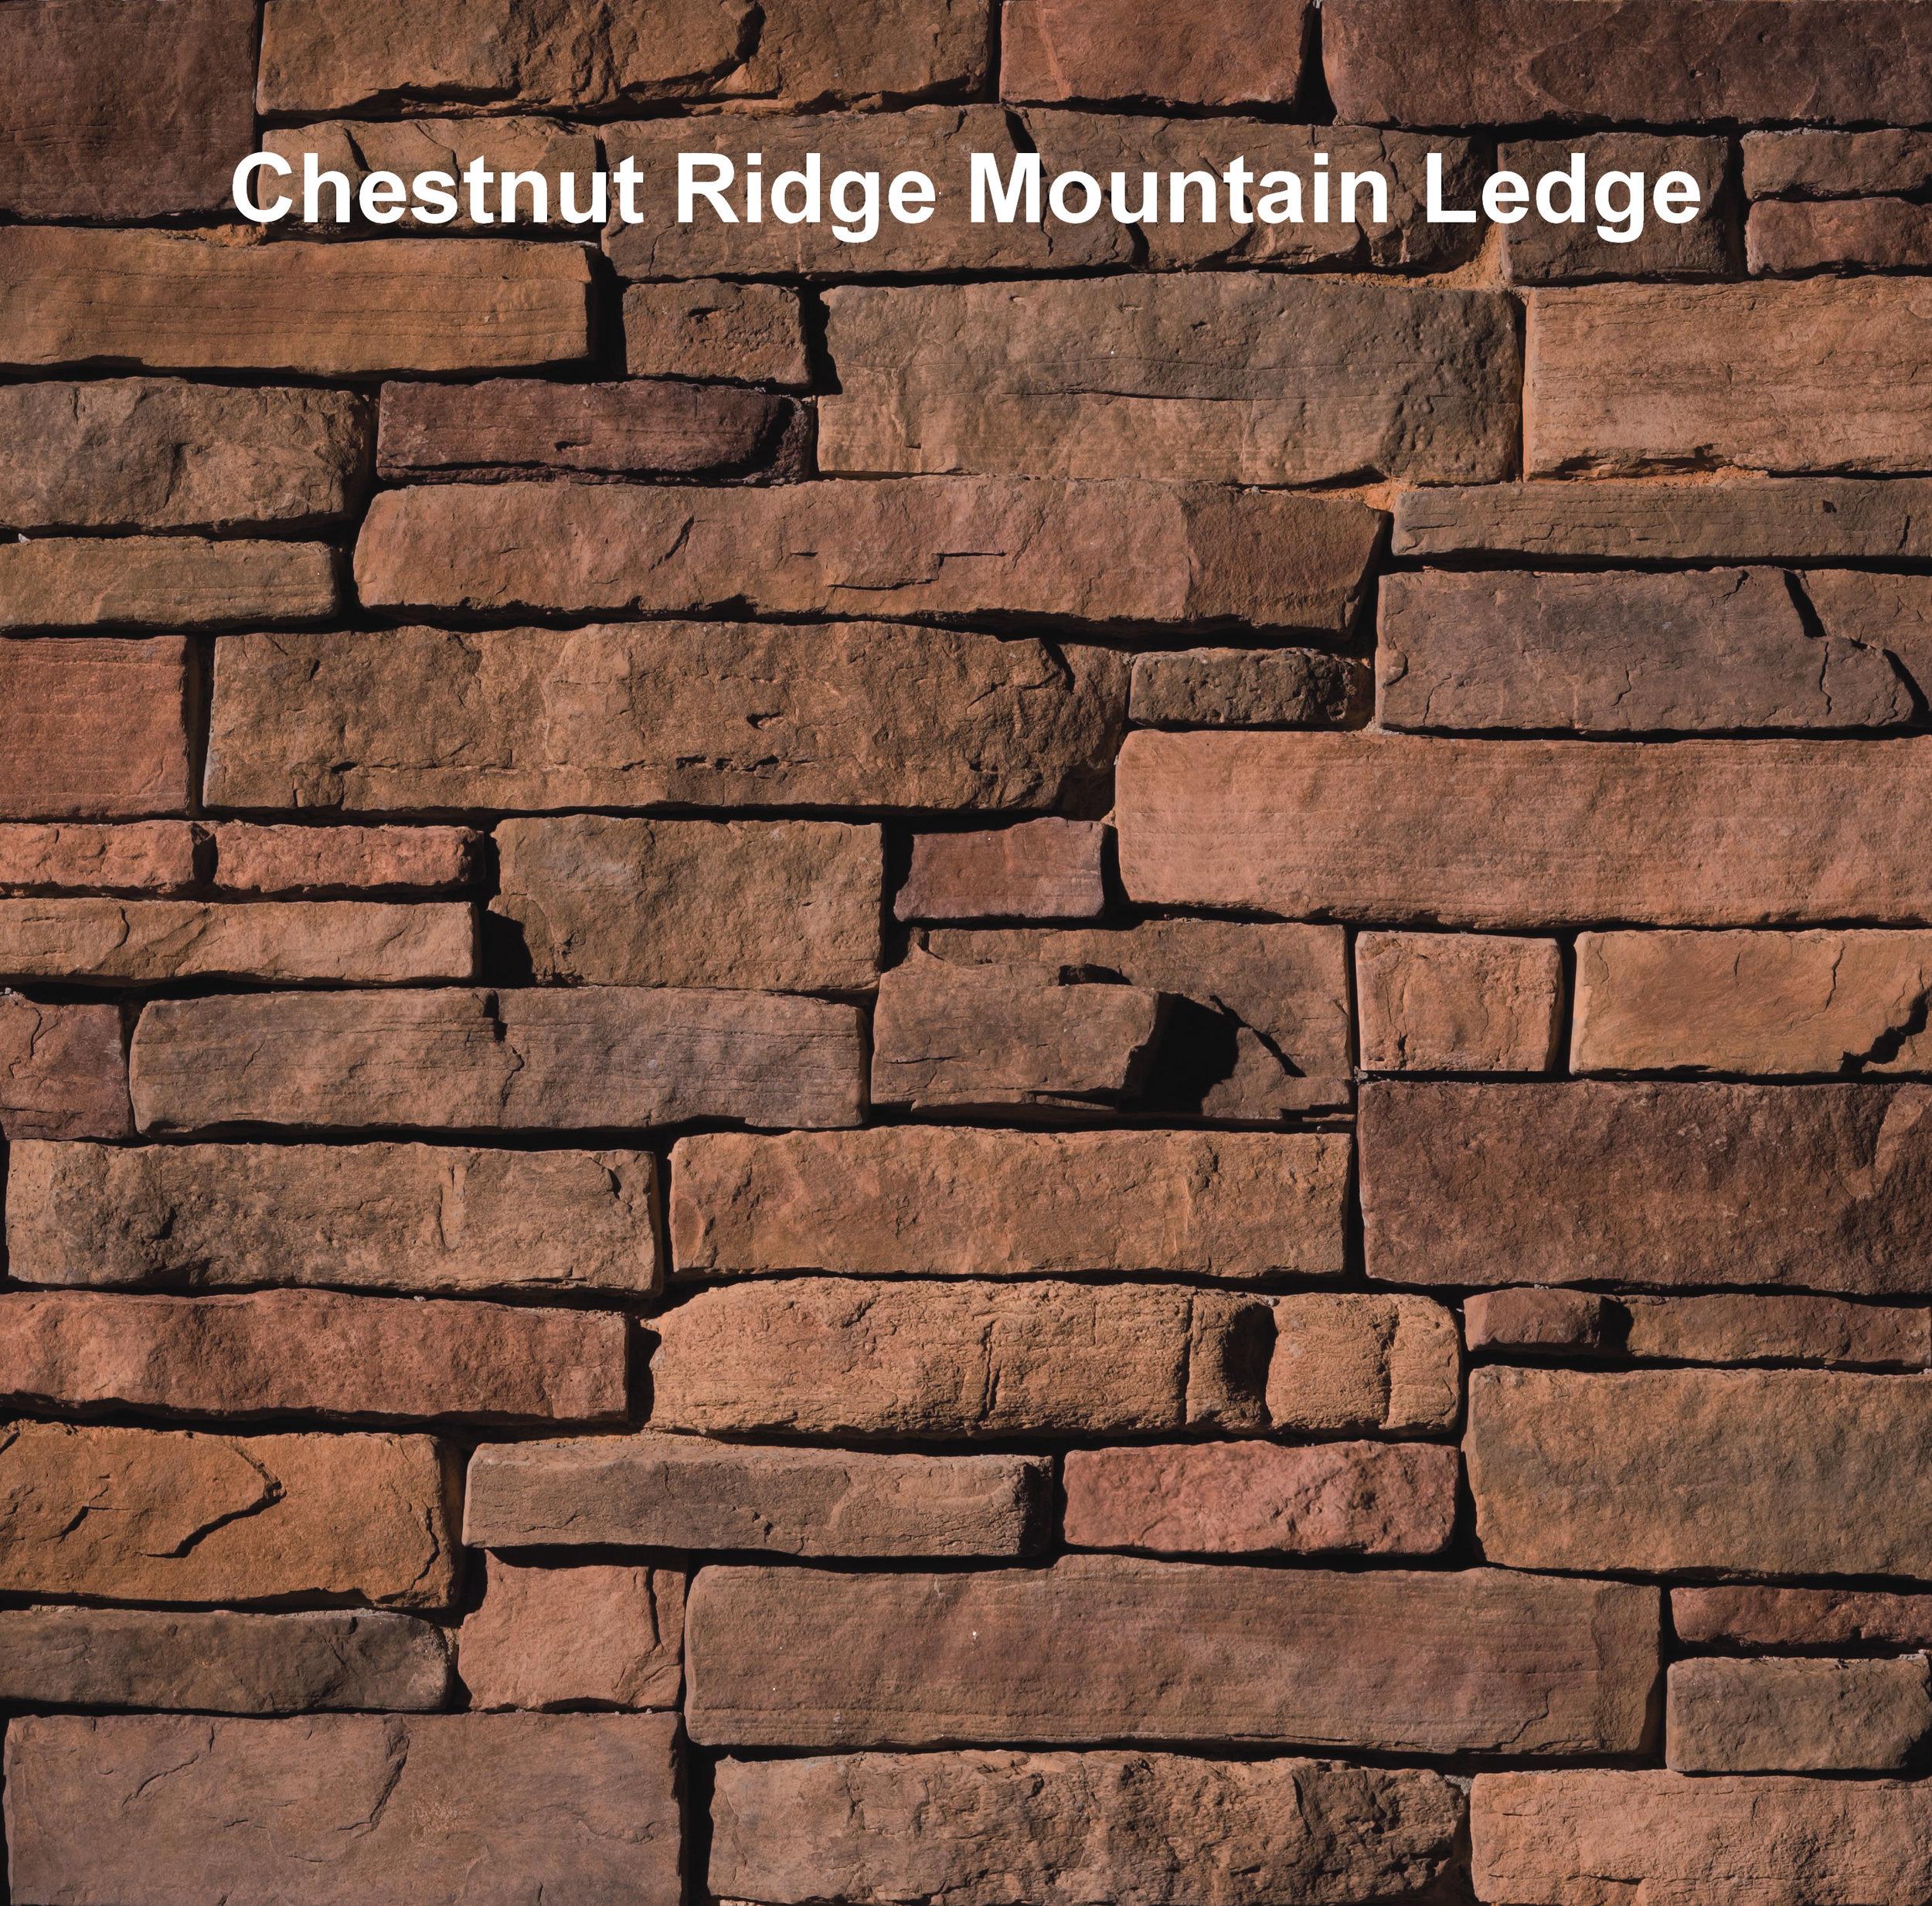 ES_Mountain Ledge_Chestnut Ridge_profile_east.jpg